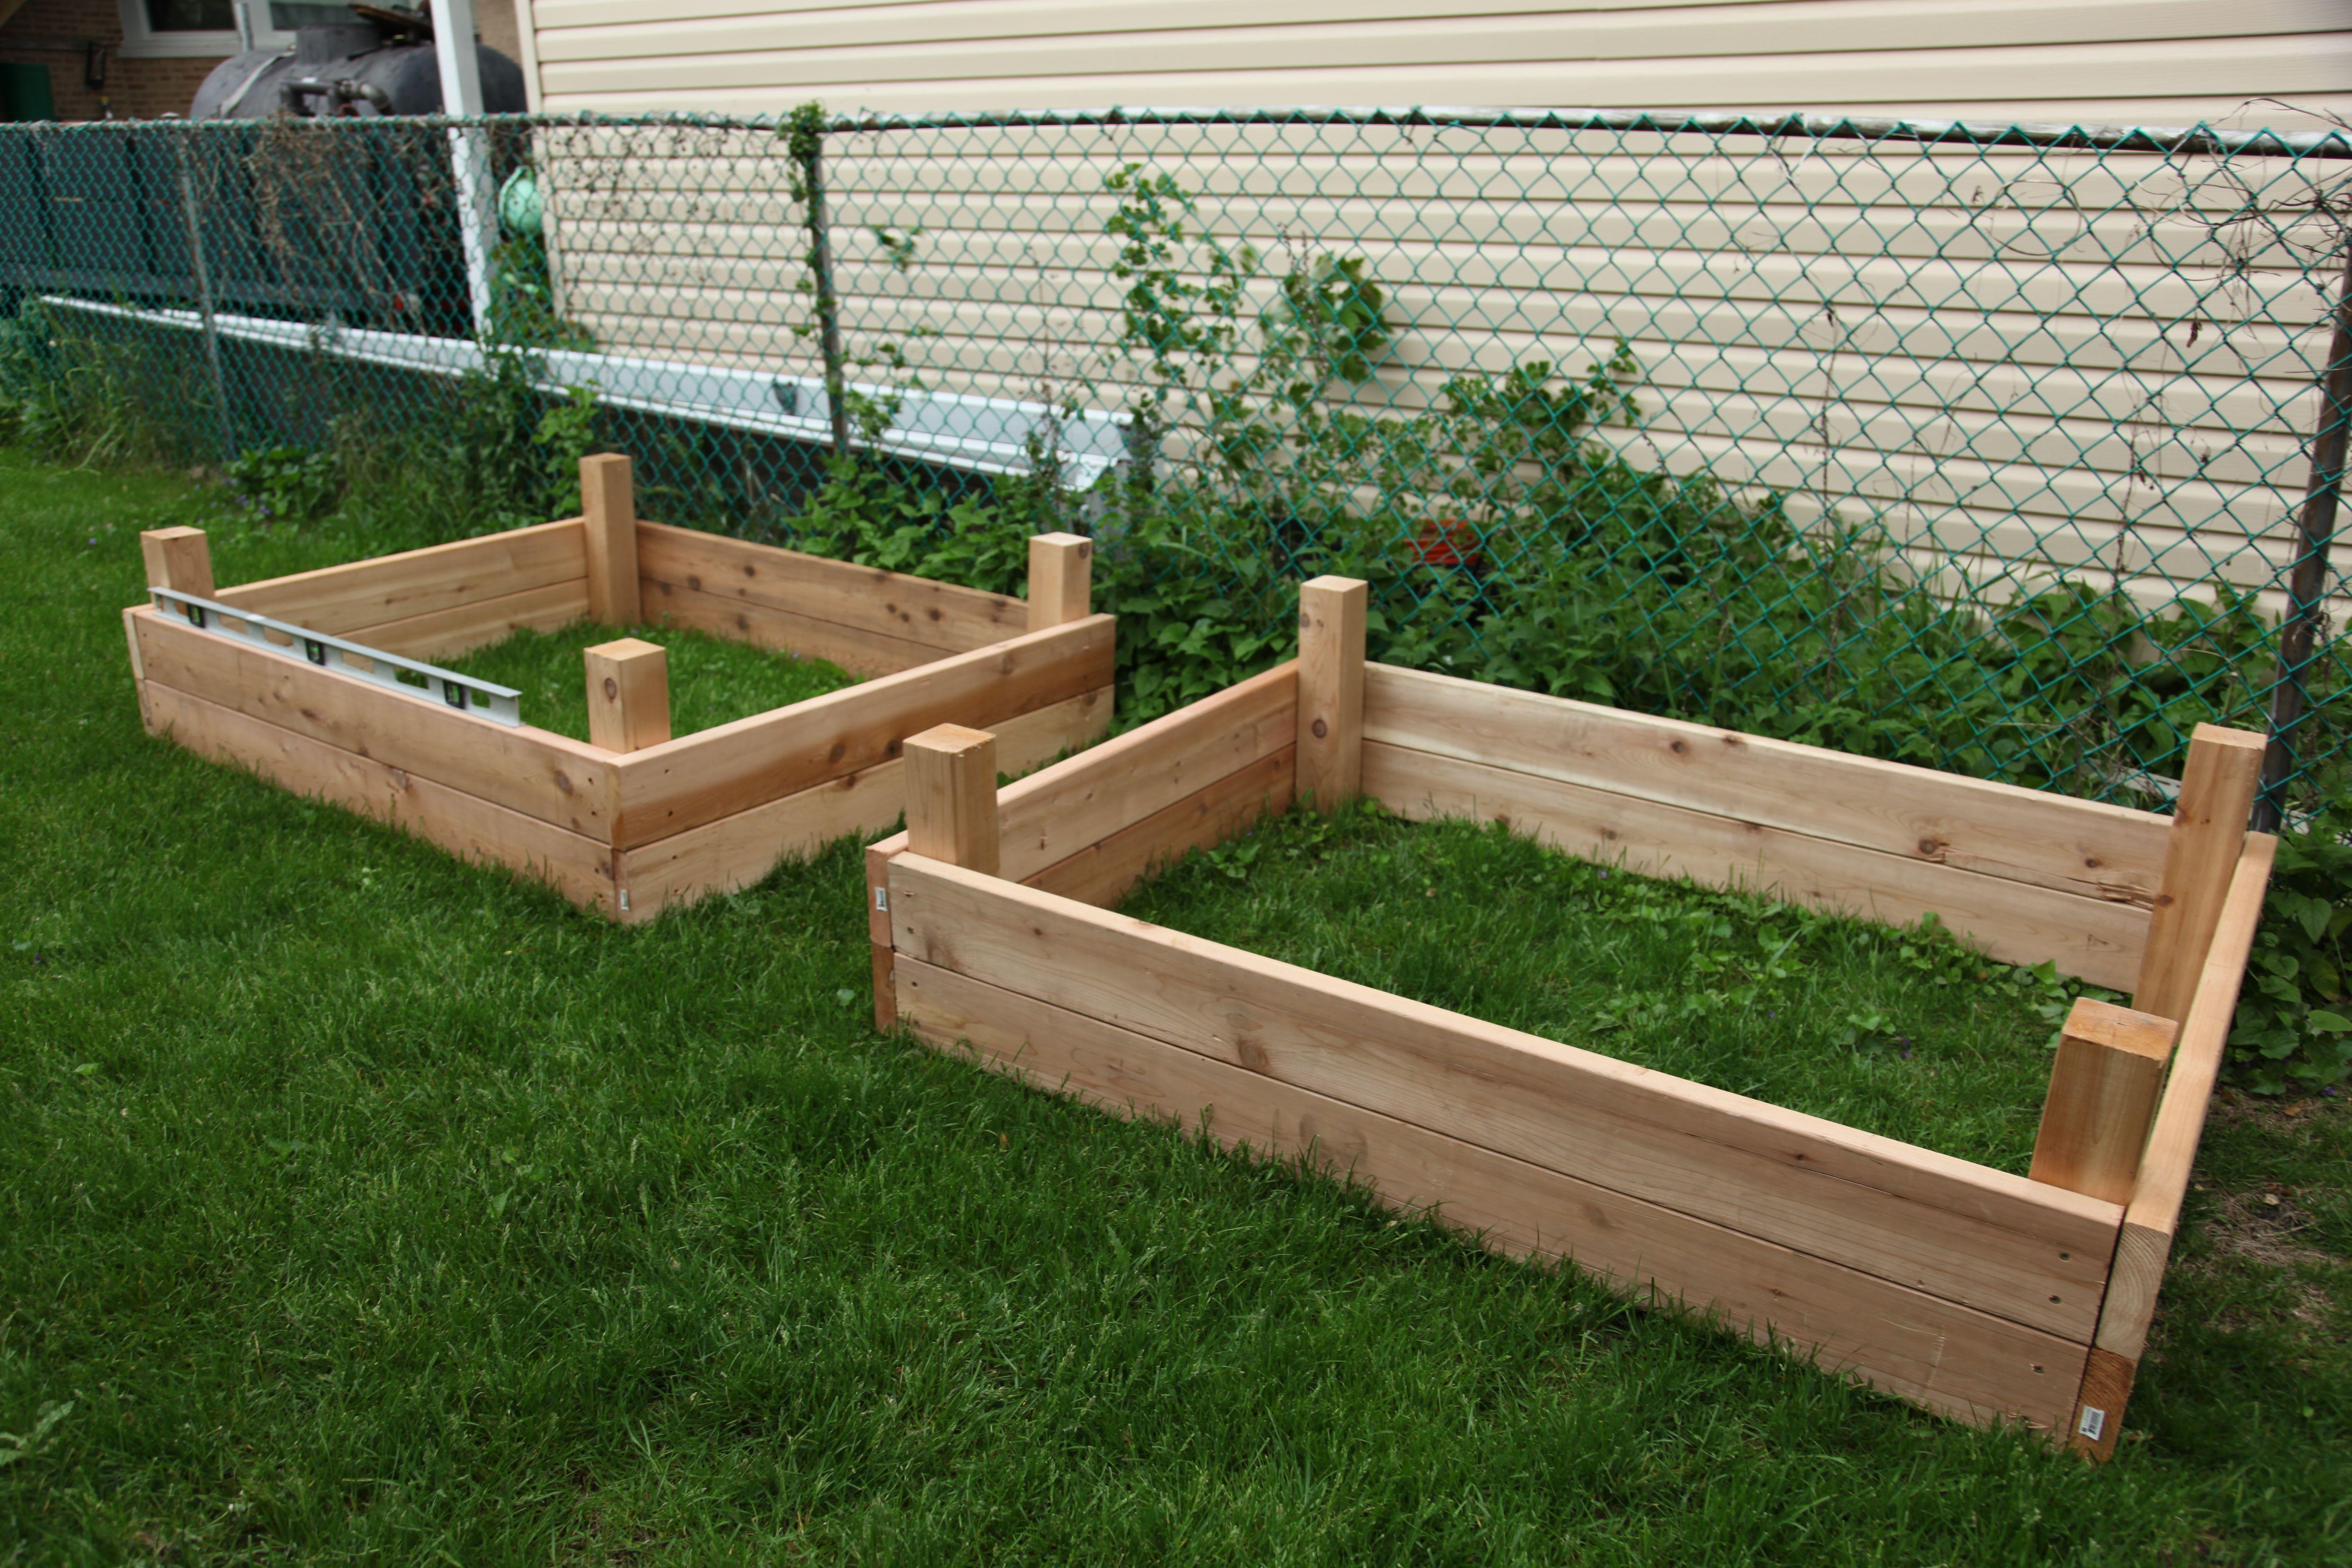 box duo garden pinterest raised garden bed plans gardens and garden boxes. Black Bedroom Furniture Sets. Home Design Ideas